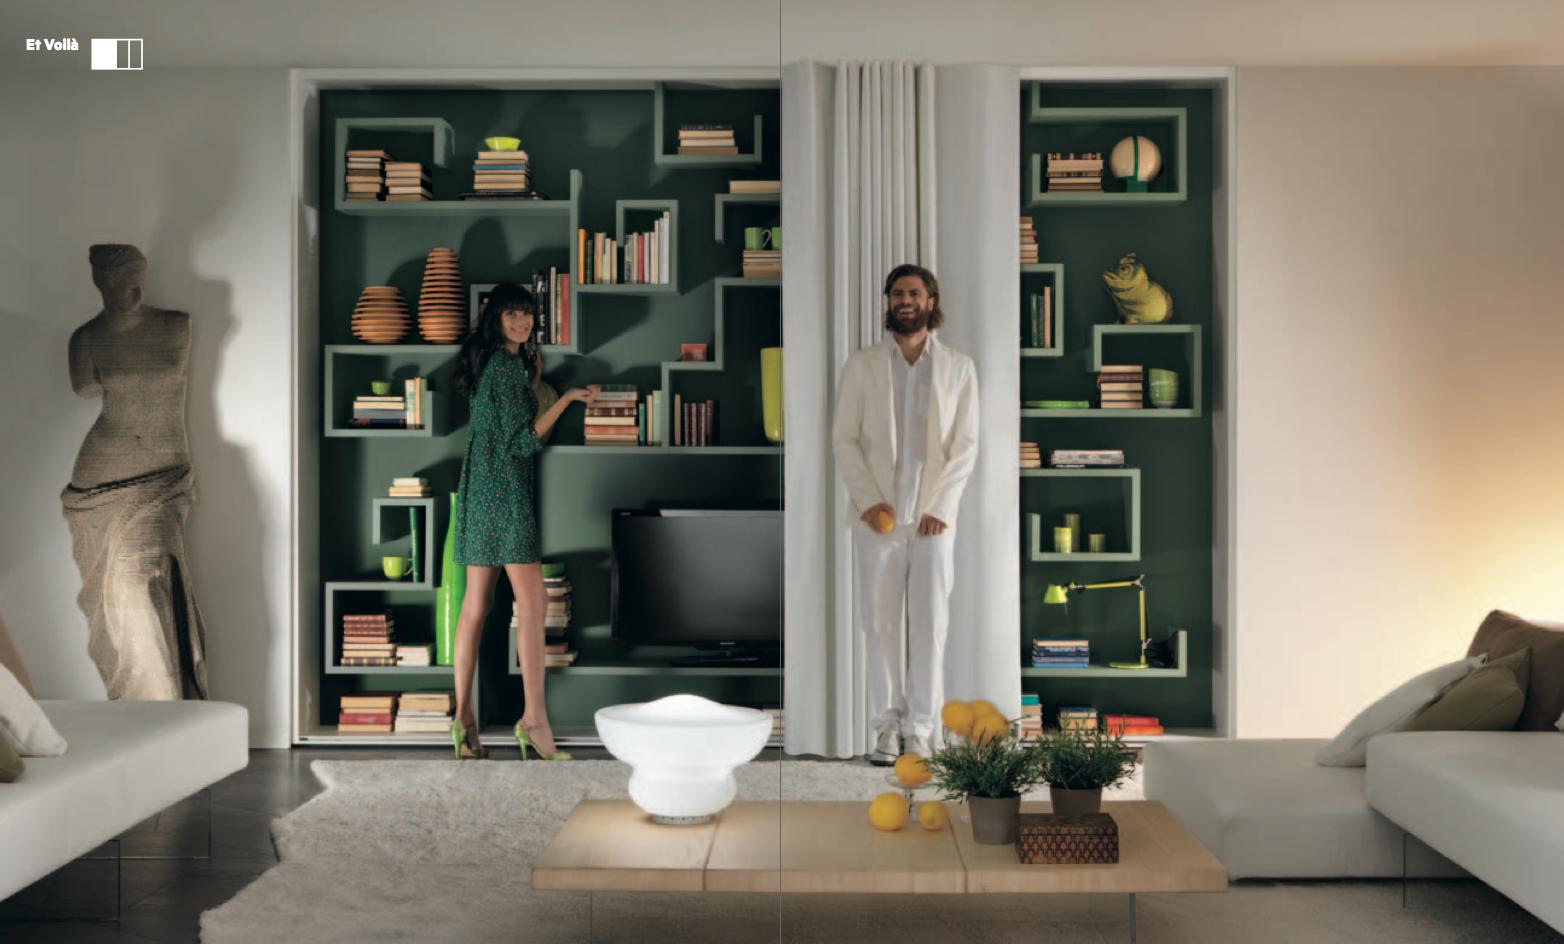 Bibliothèque AIR derrière dressing ET VOILA #lago #interiordesign #arlydesign #vert #green #mettezduvertdansladéco